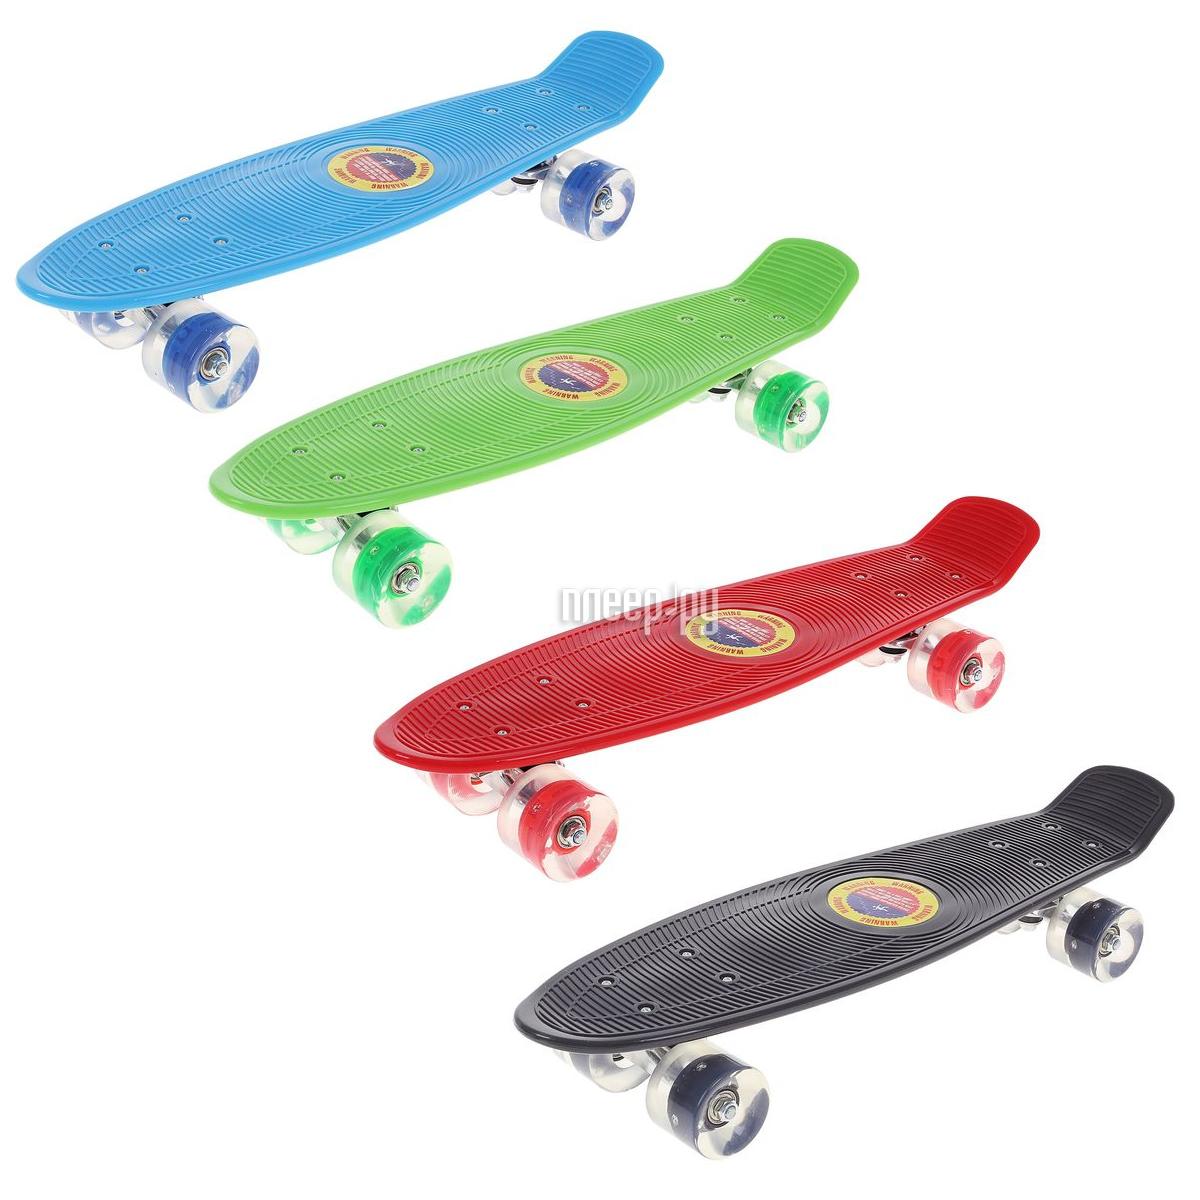 Скейт СИМА-ЛЕНД M-350 Микс 892582 за 1000 рублей